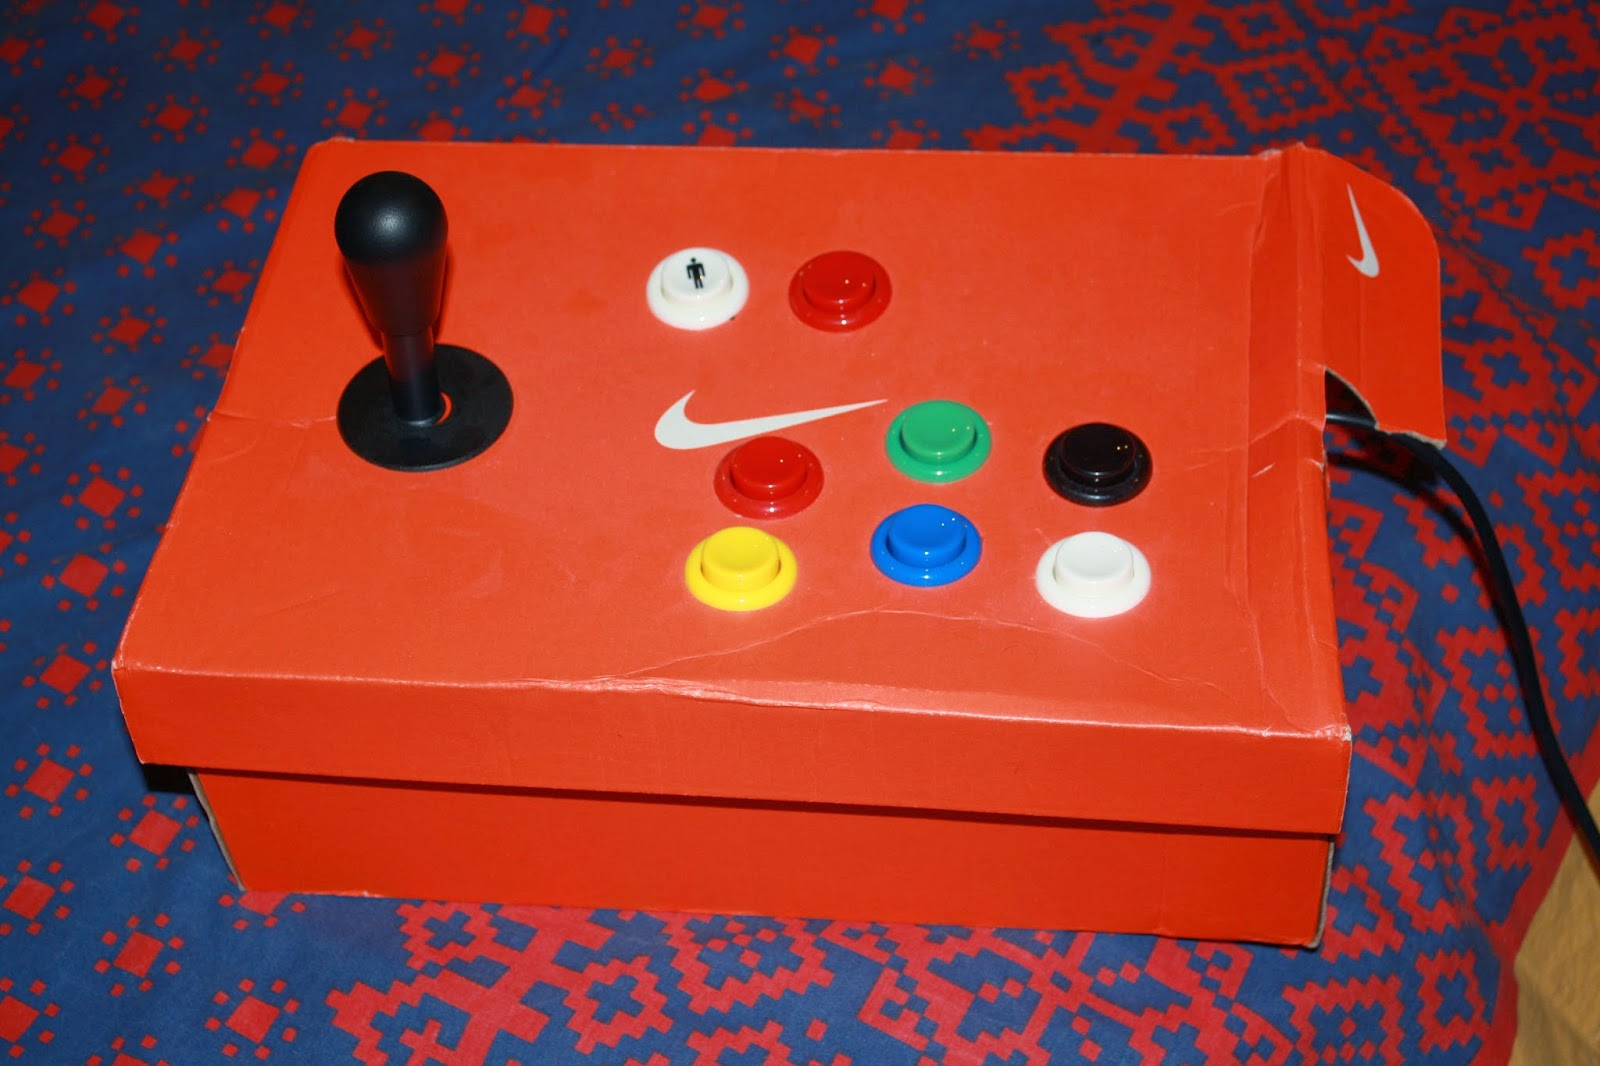 Raspberry Pi Arcade pt4 - Setting up RetroPie + Wiring